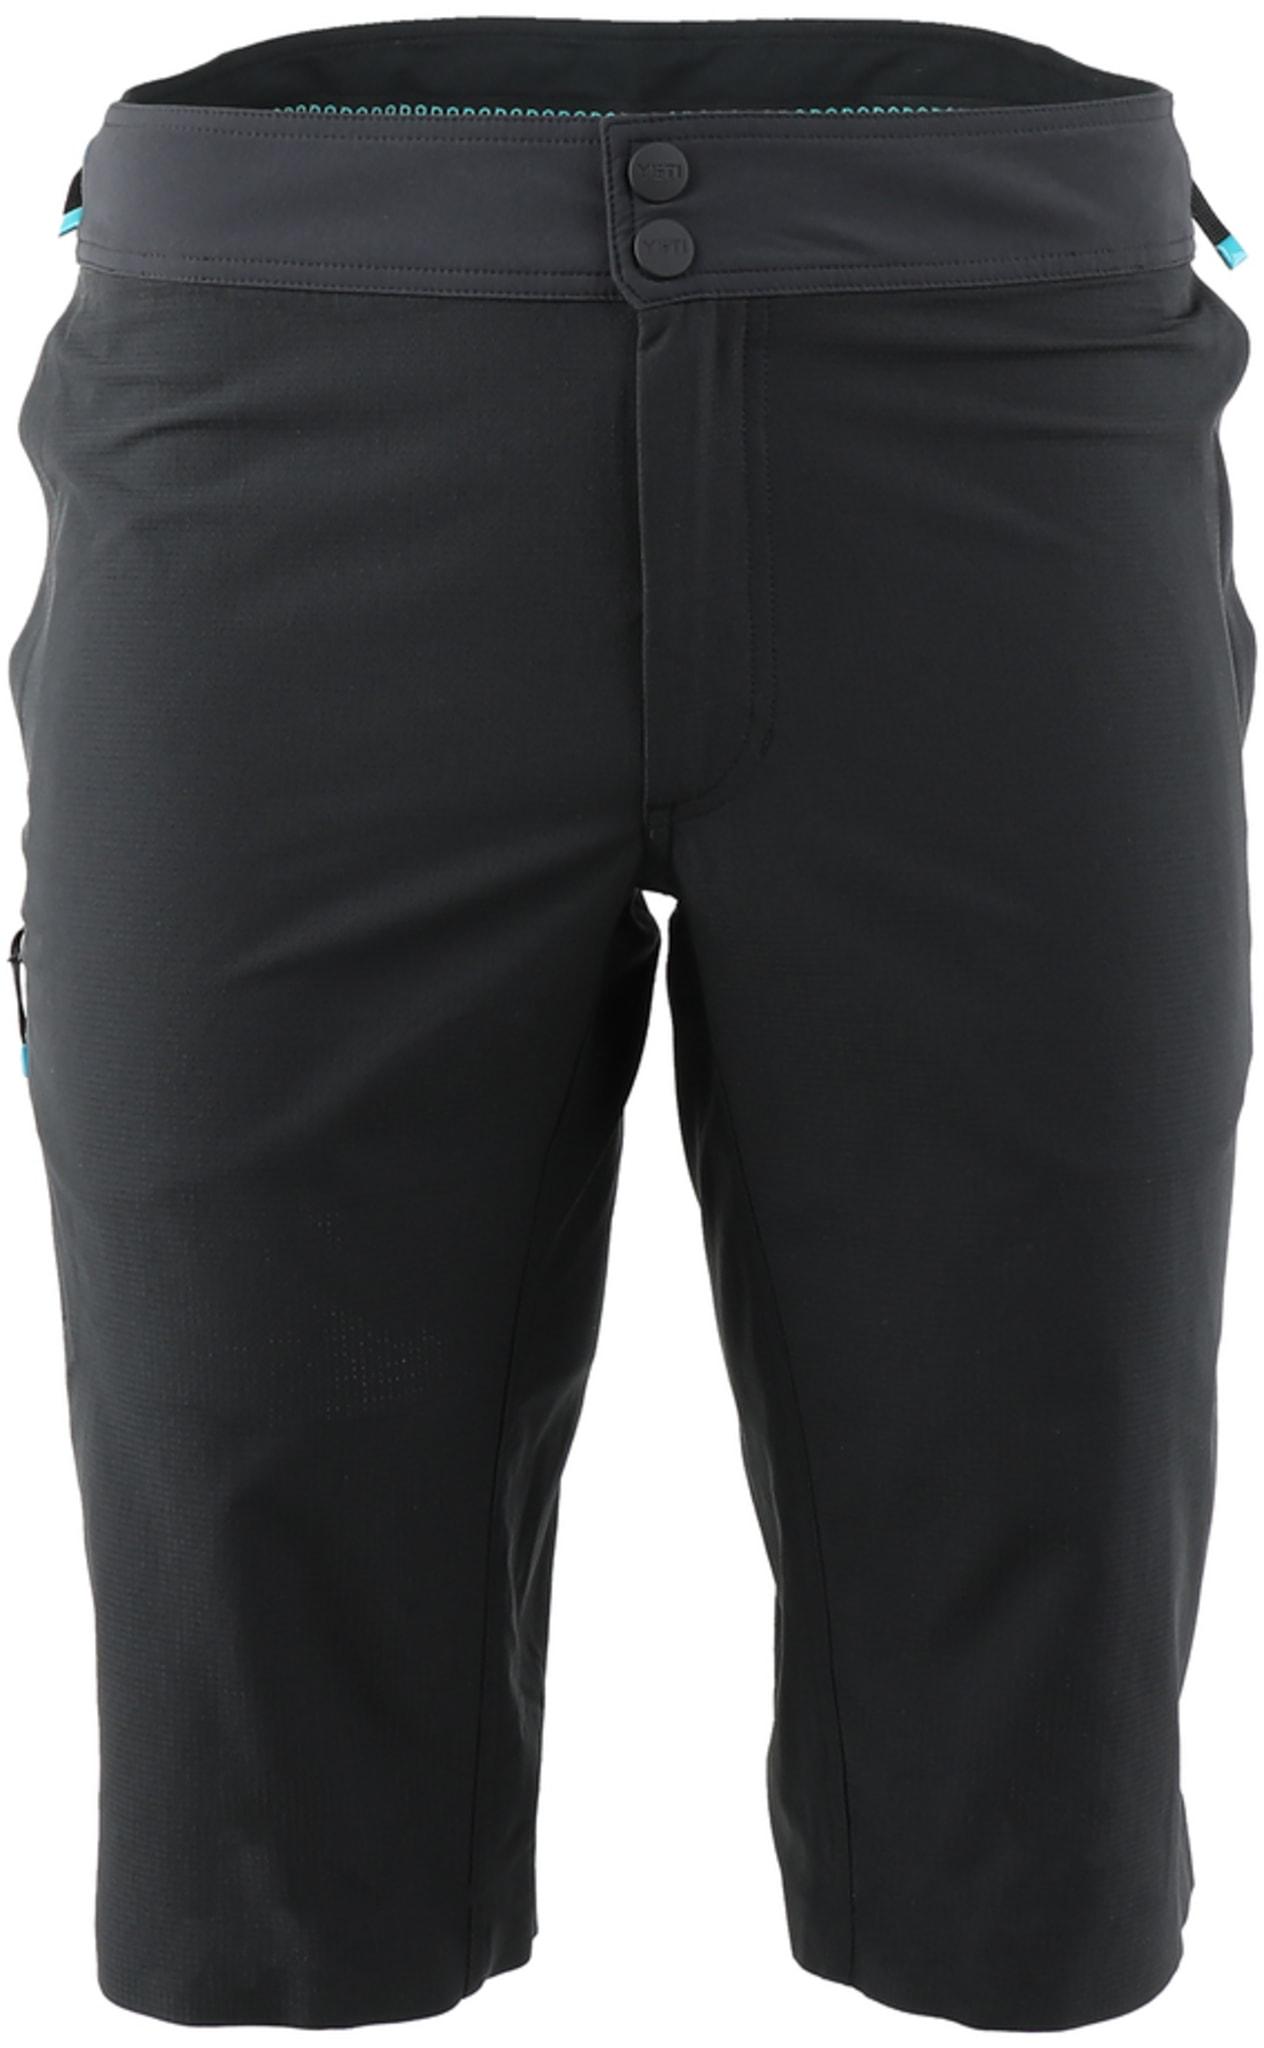 Turq Dot Air Shorts M